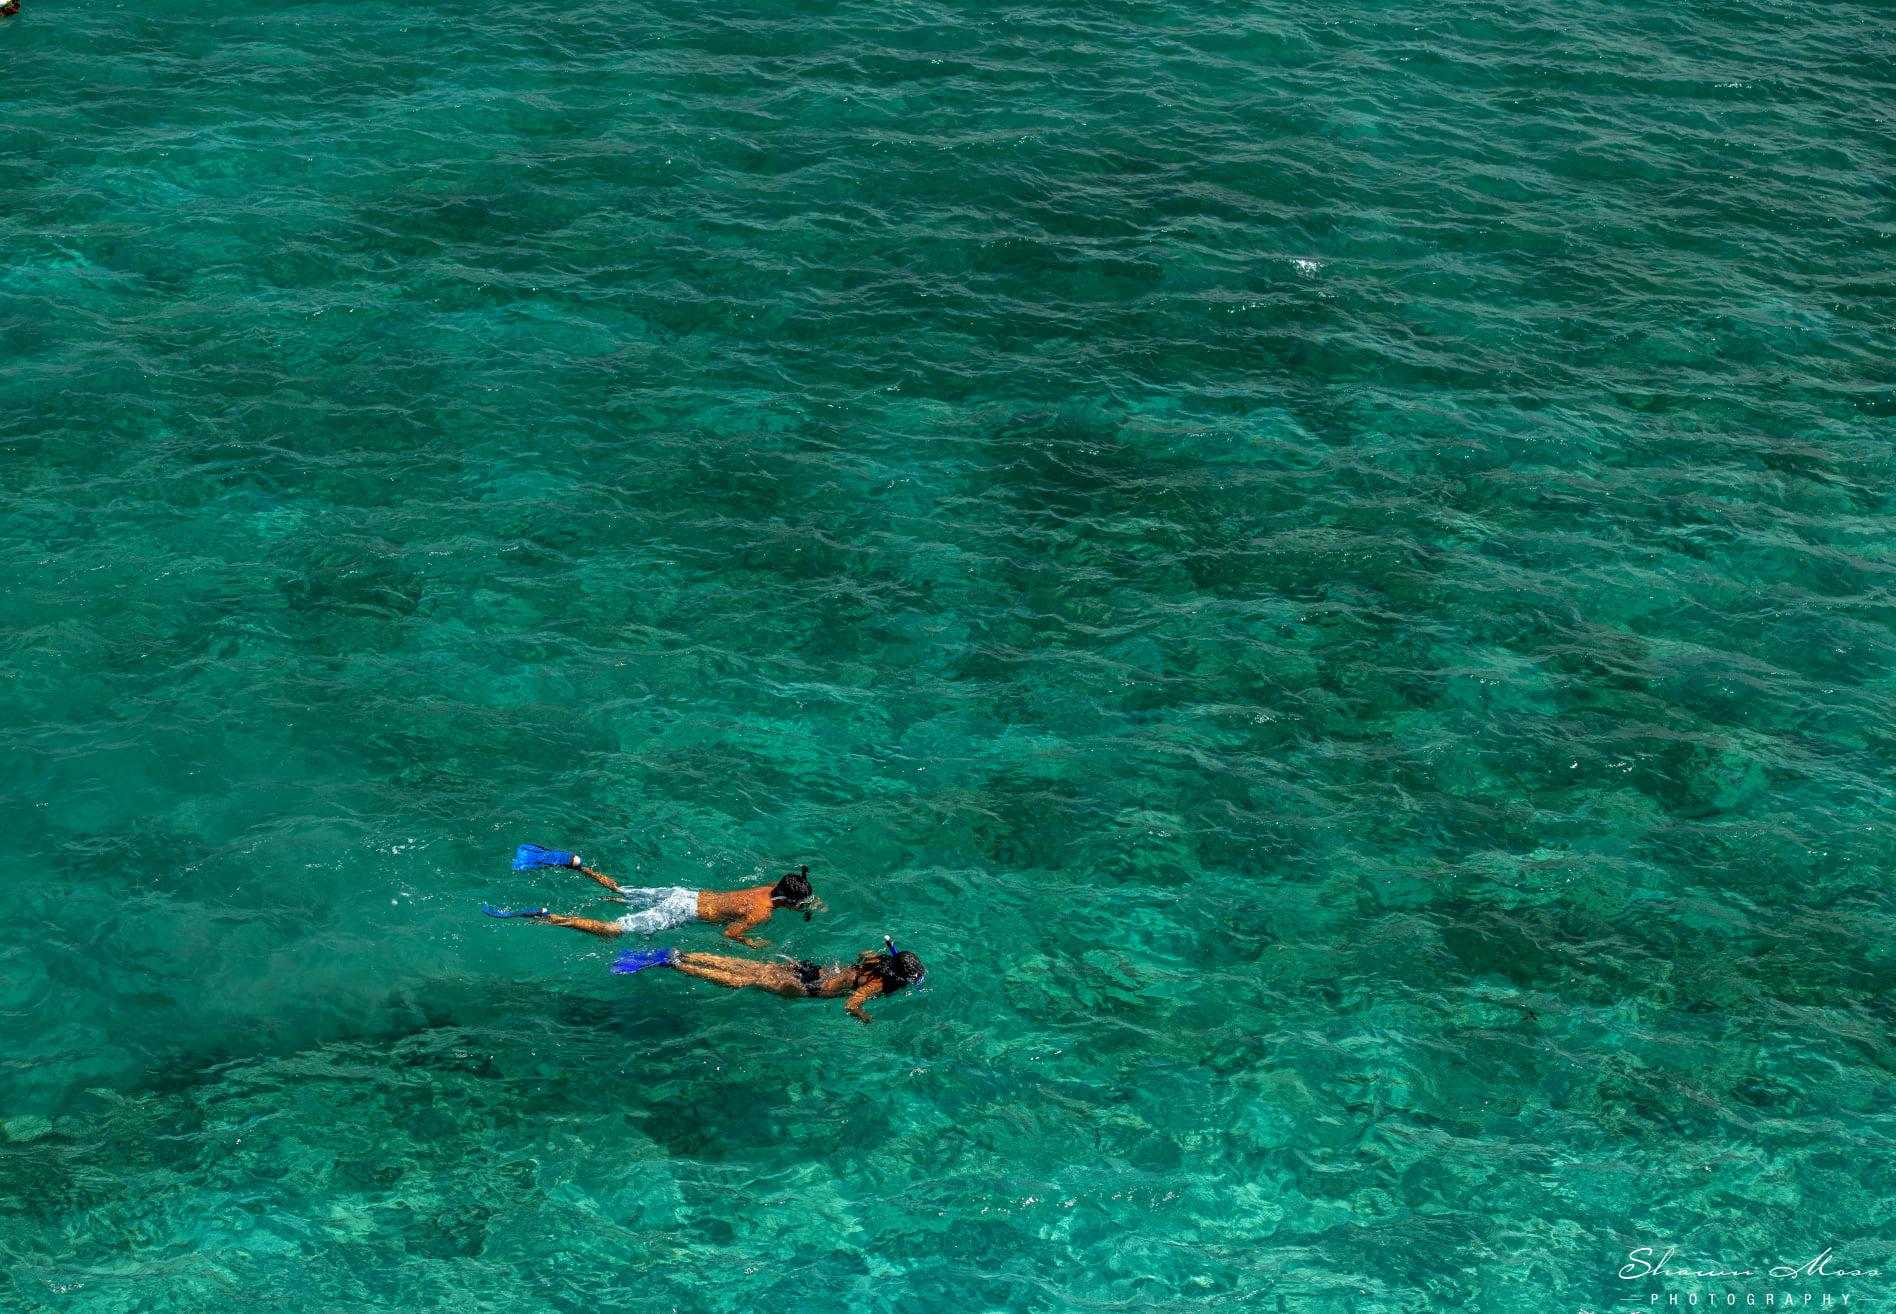 Two snorkelers in aqua green water